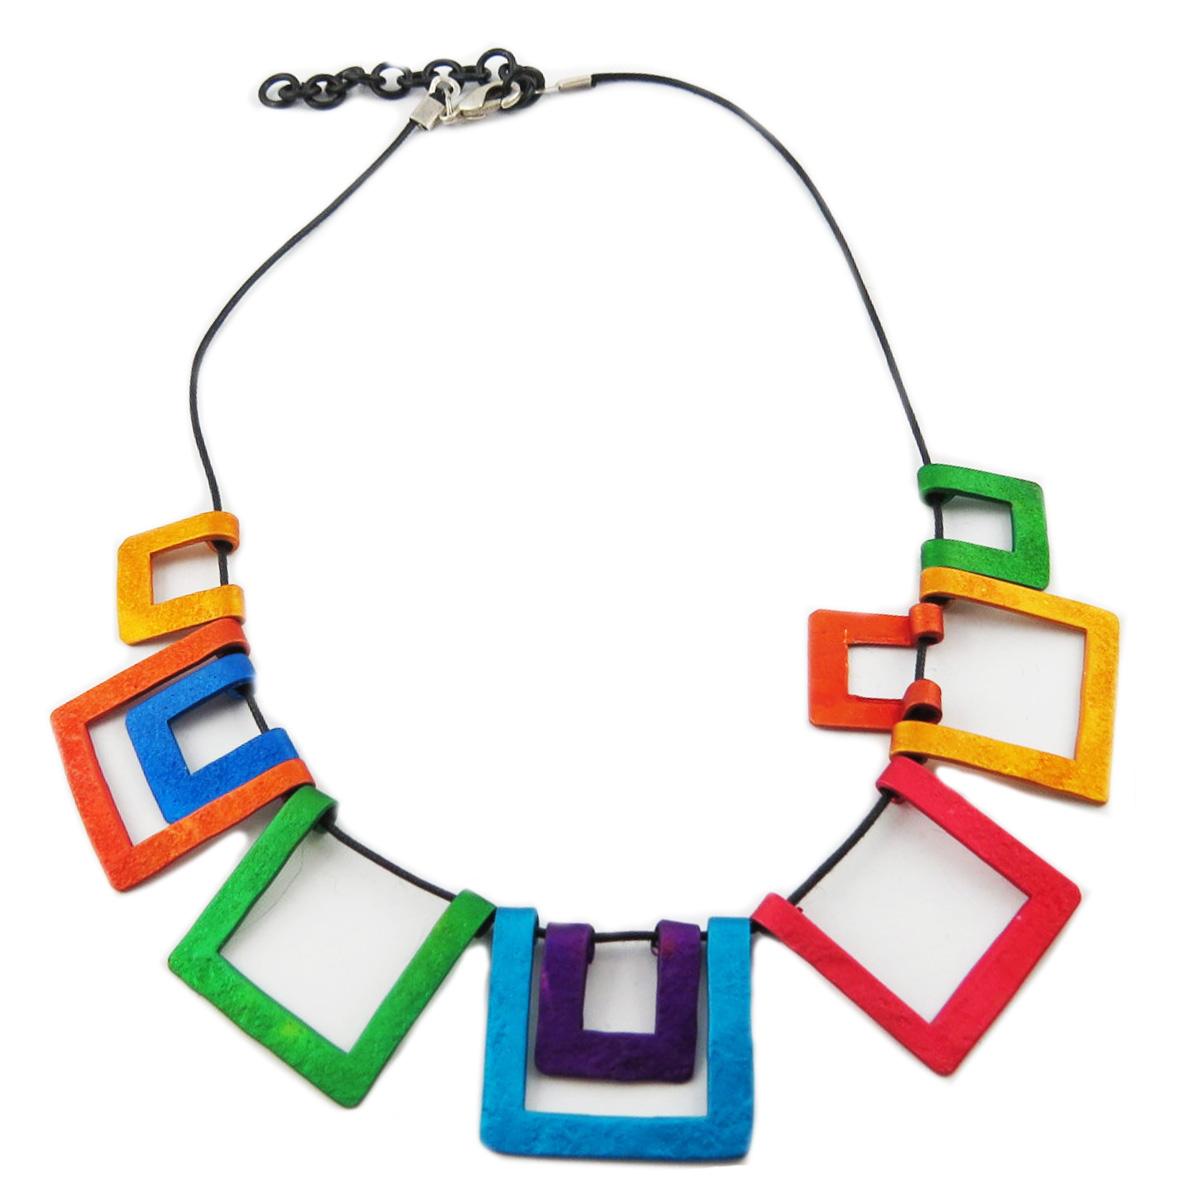 Collier artisanal \'Aluminirock\' multicolore - largeur 25 cm - [R1220]